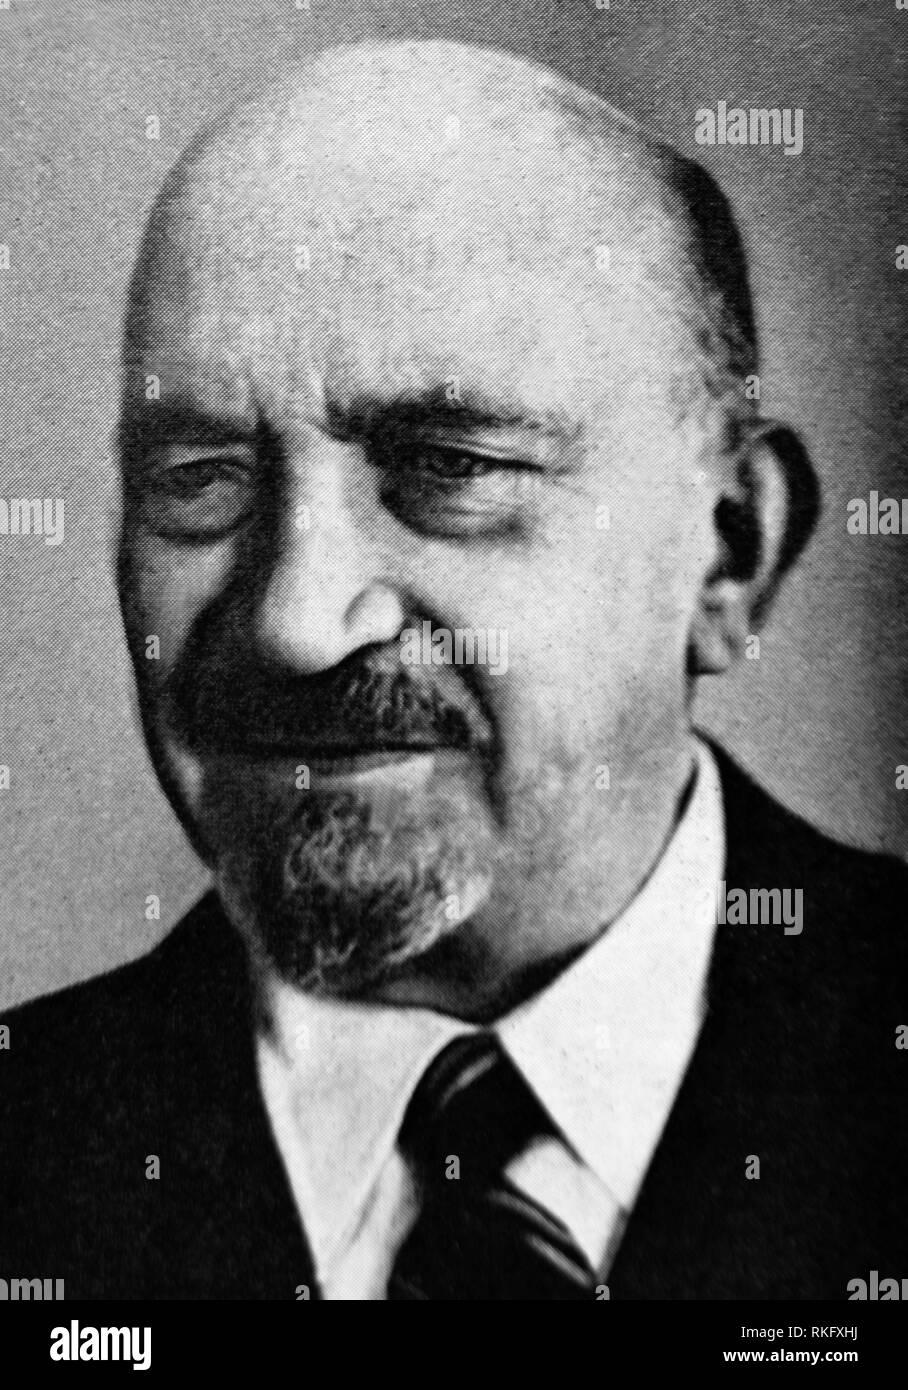 Chaim Weizmann.Chaim Azriel Weizmann (27 November 1874- 9 November 1952) was a Zionist leader and Israeli statesman who served as President of the - Stock Image